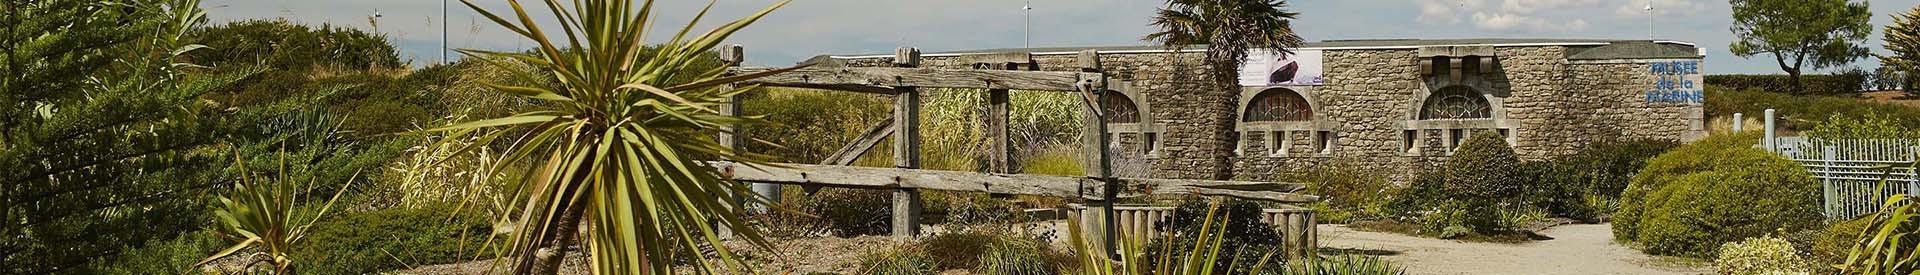 parc-jardin-littoral-st-brevin-20-149